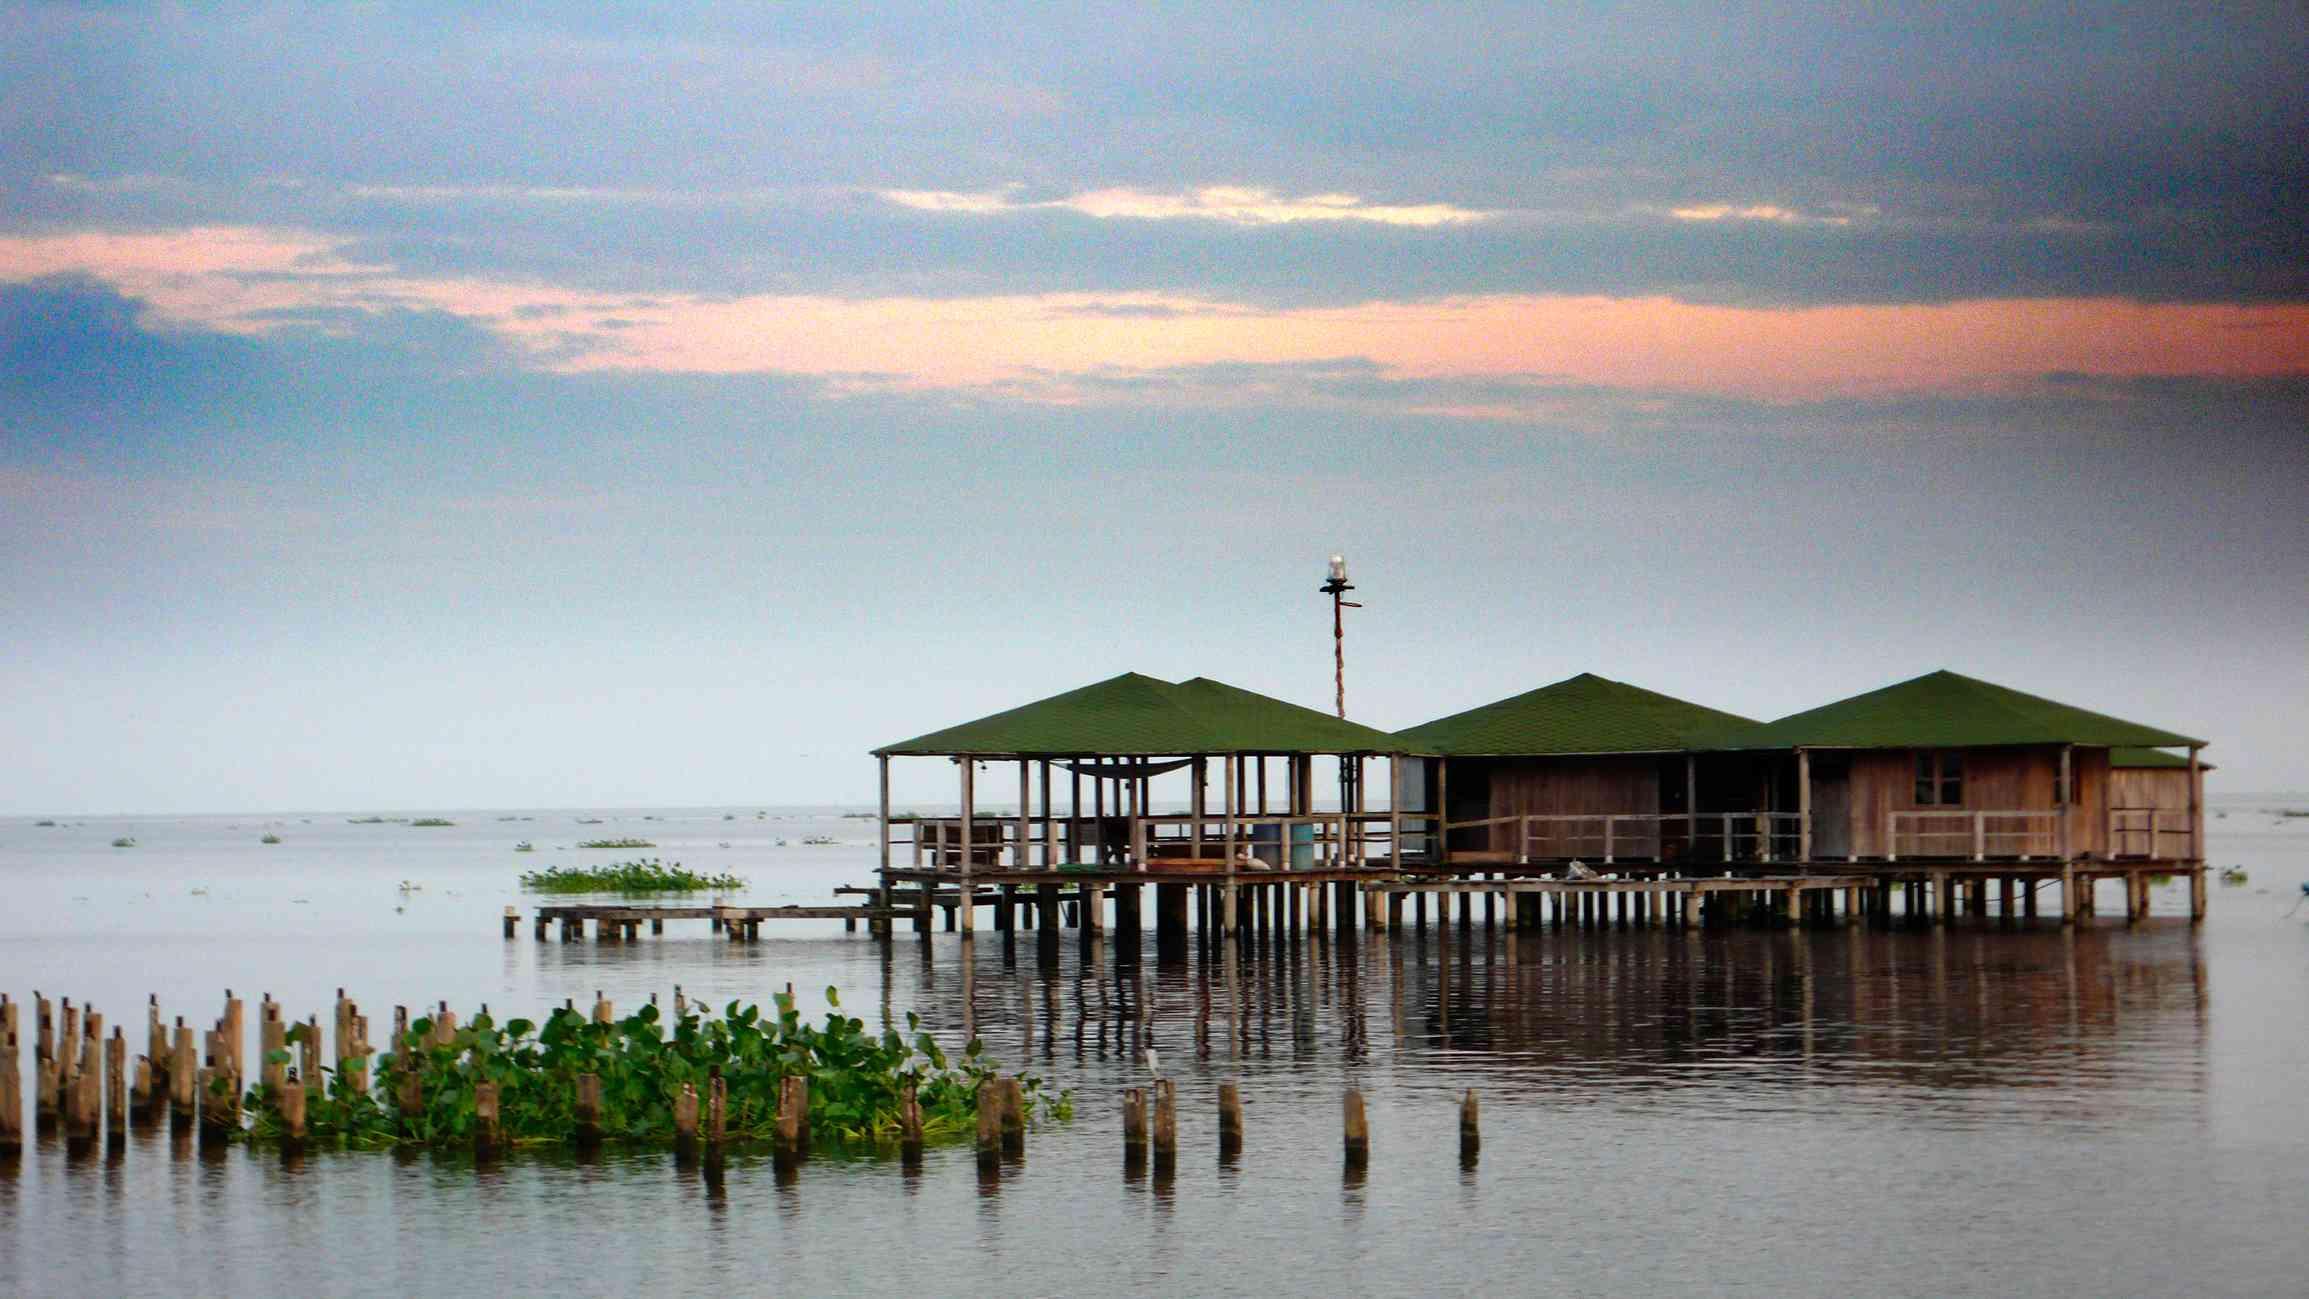 Park rangers huts on Lake Maracaibo.